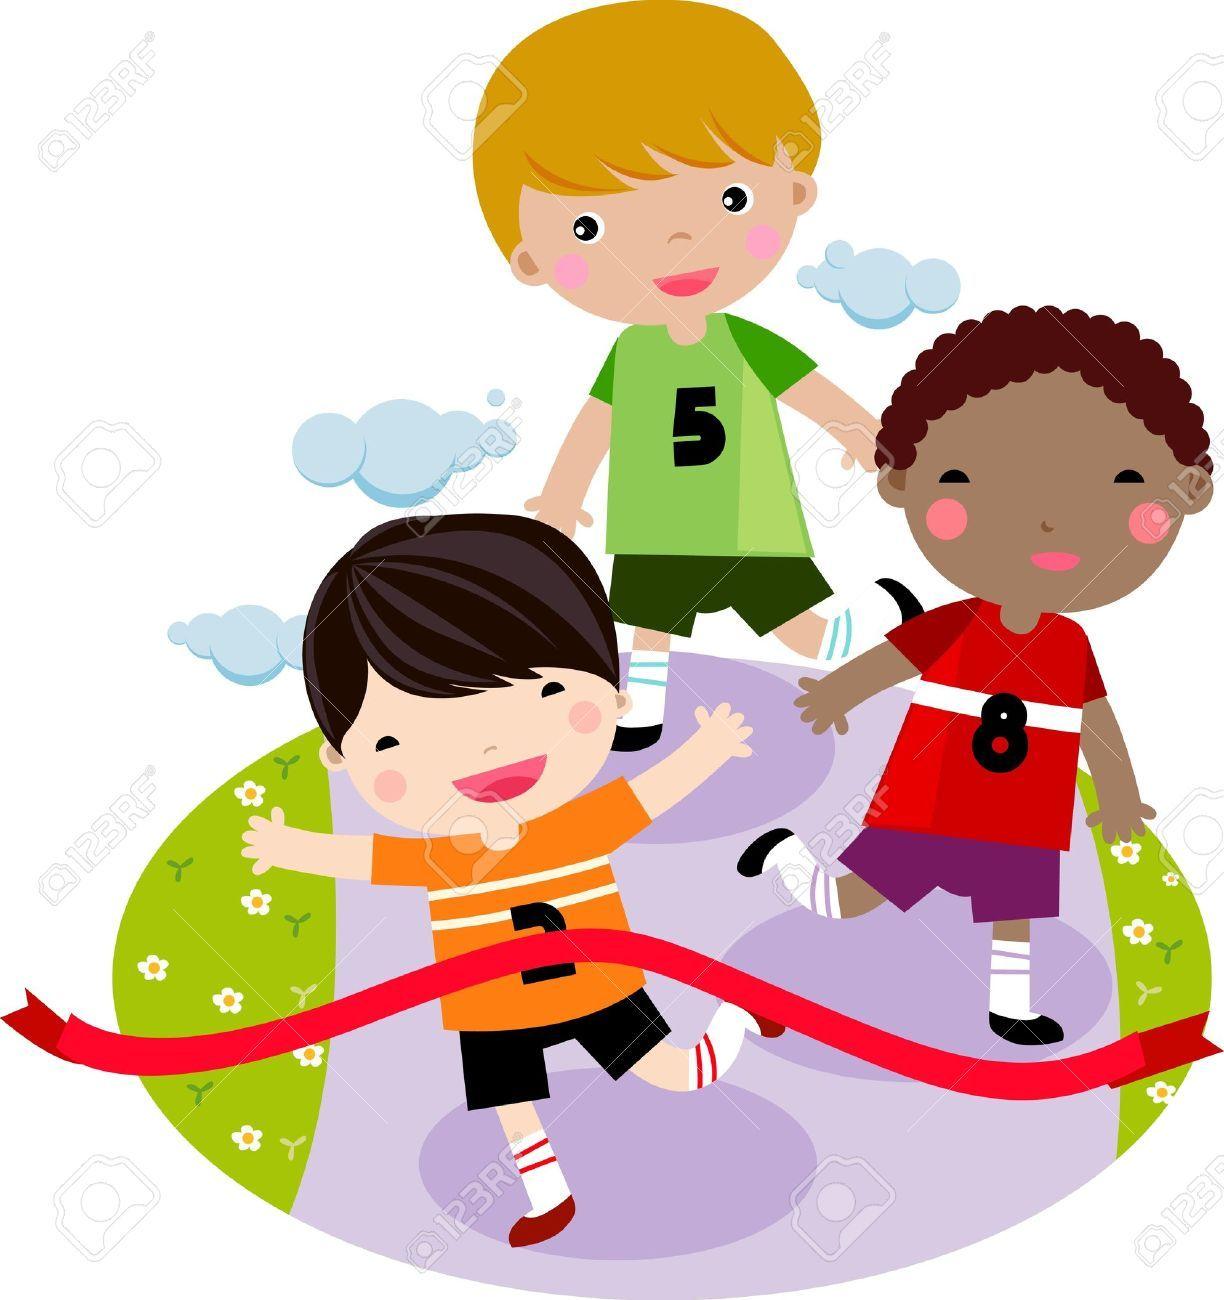 Kids running around clipart banner black and white download Clipart kids running 5 » Clipart Portal banner black and white download